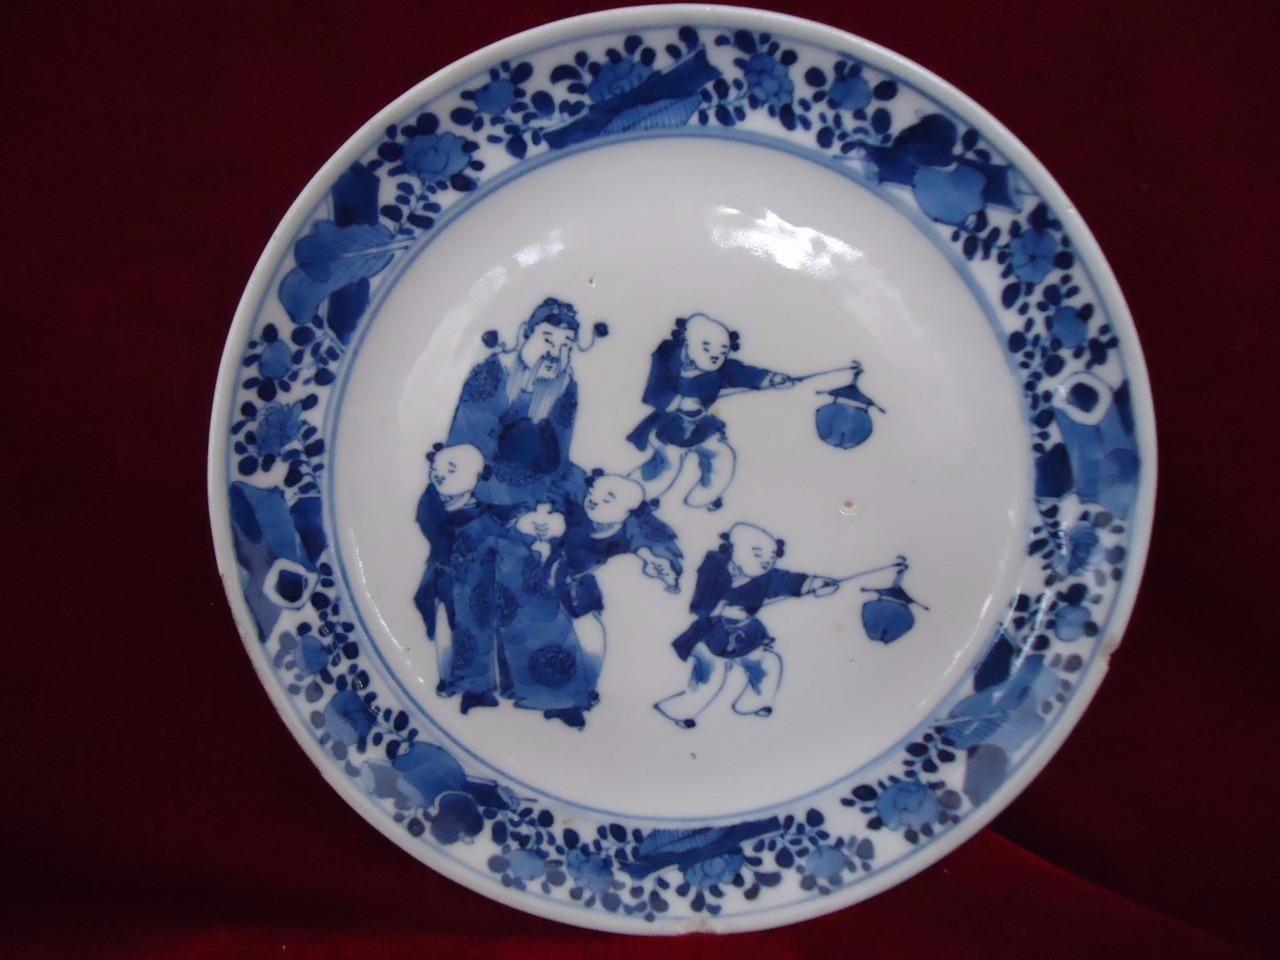 Rare Antique Chinese 18thC KangXi Blue \u0026 White Porcelain Plate   eBay & Rare Antique Chinese 18thC KangXi Blue \u0026 White Porcelain Plate ...